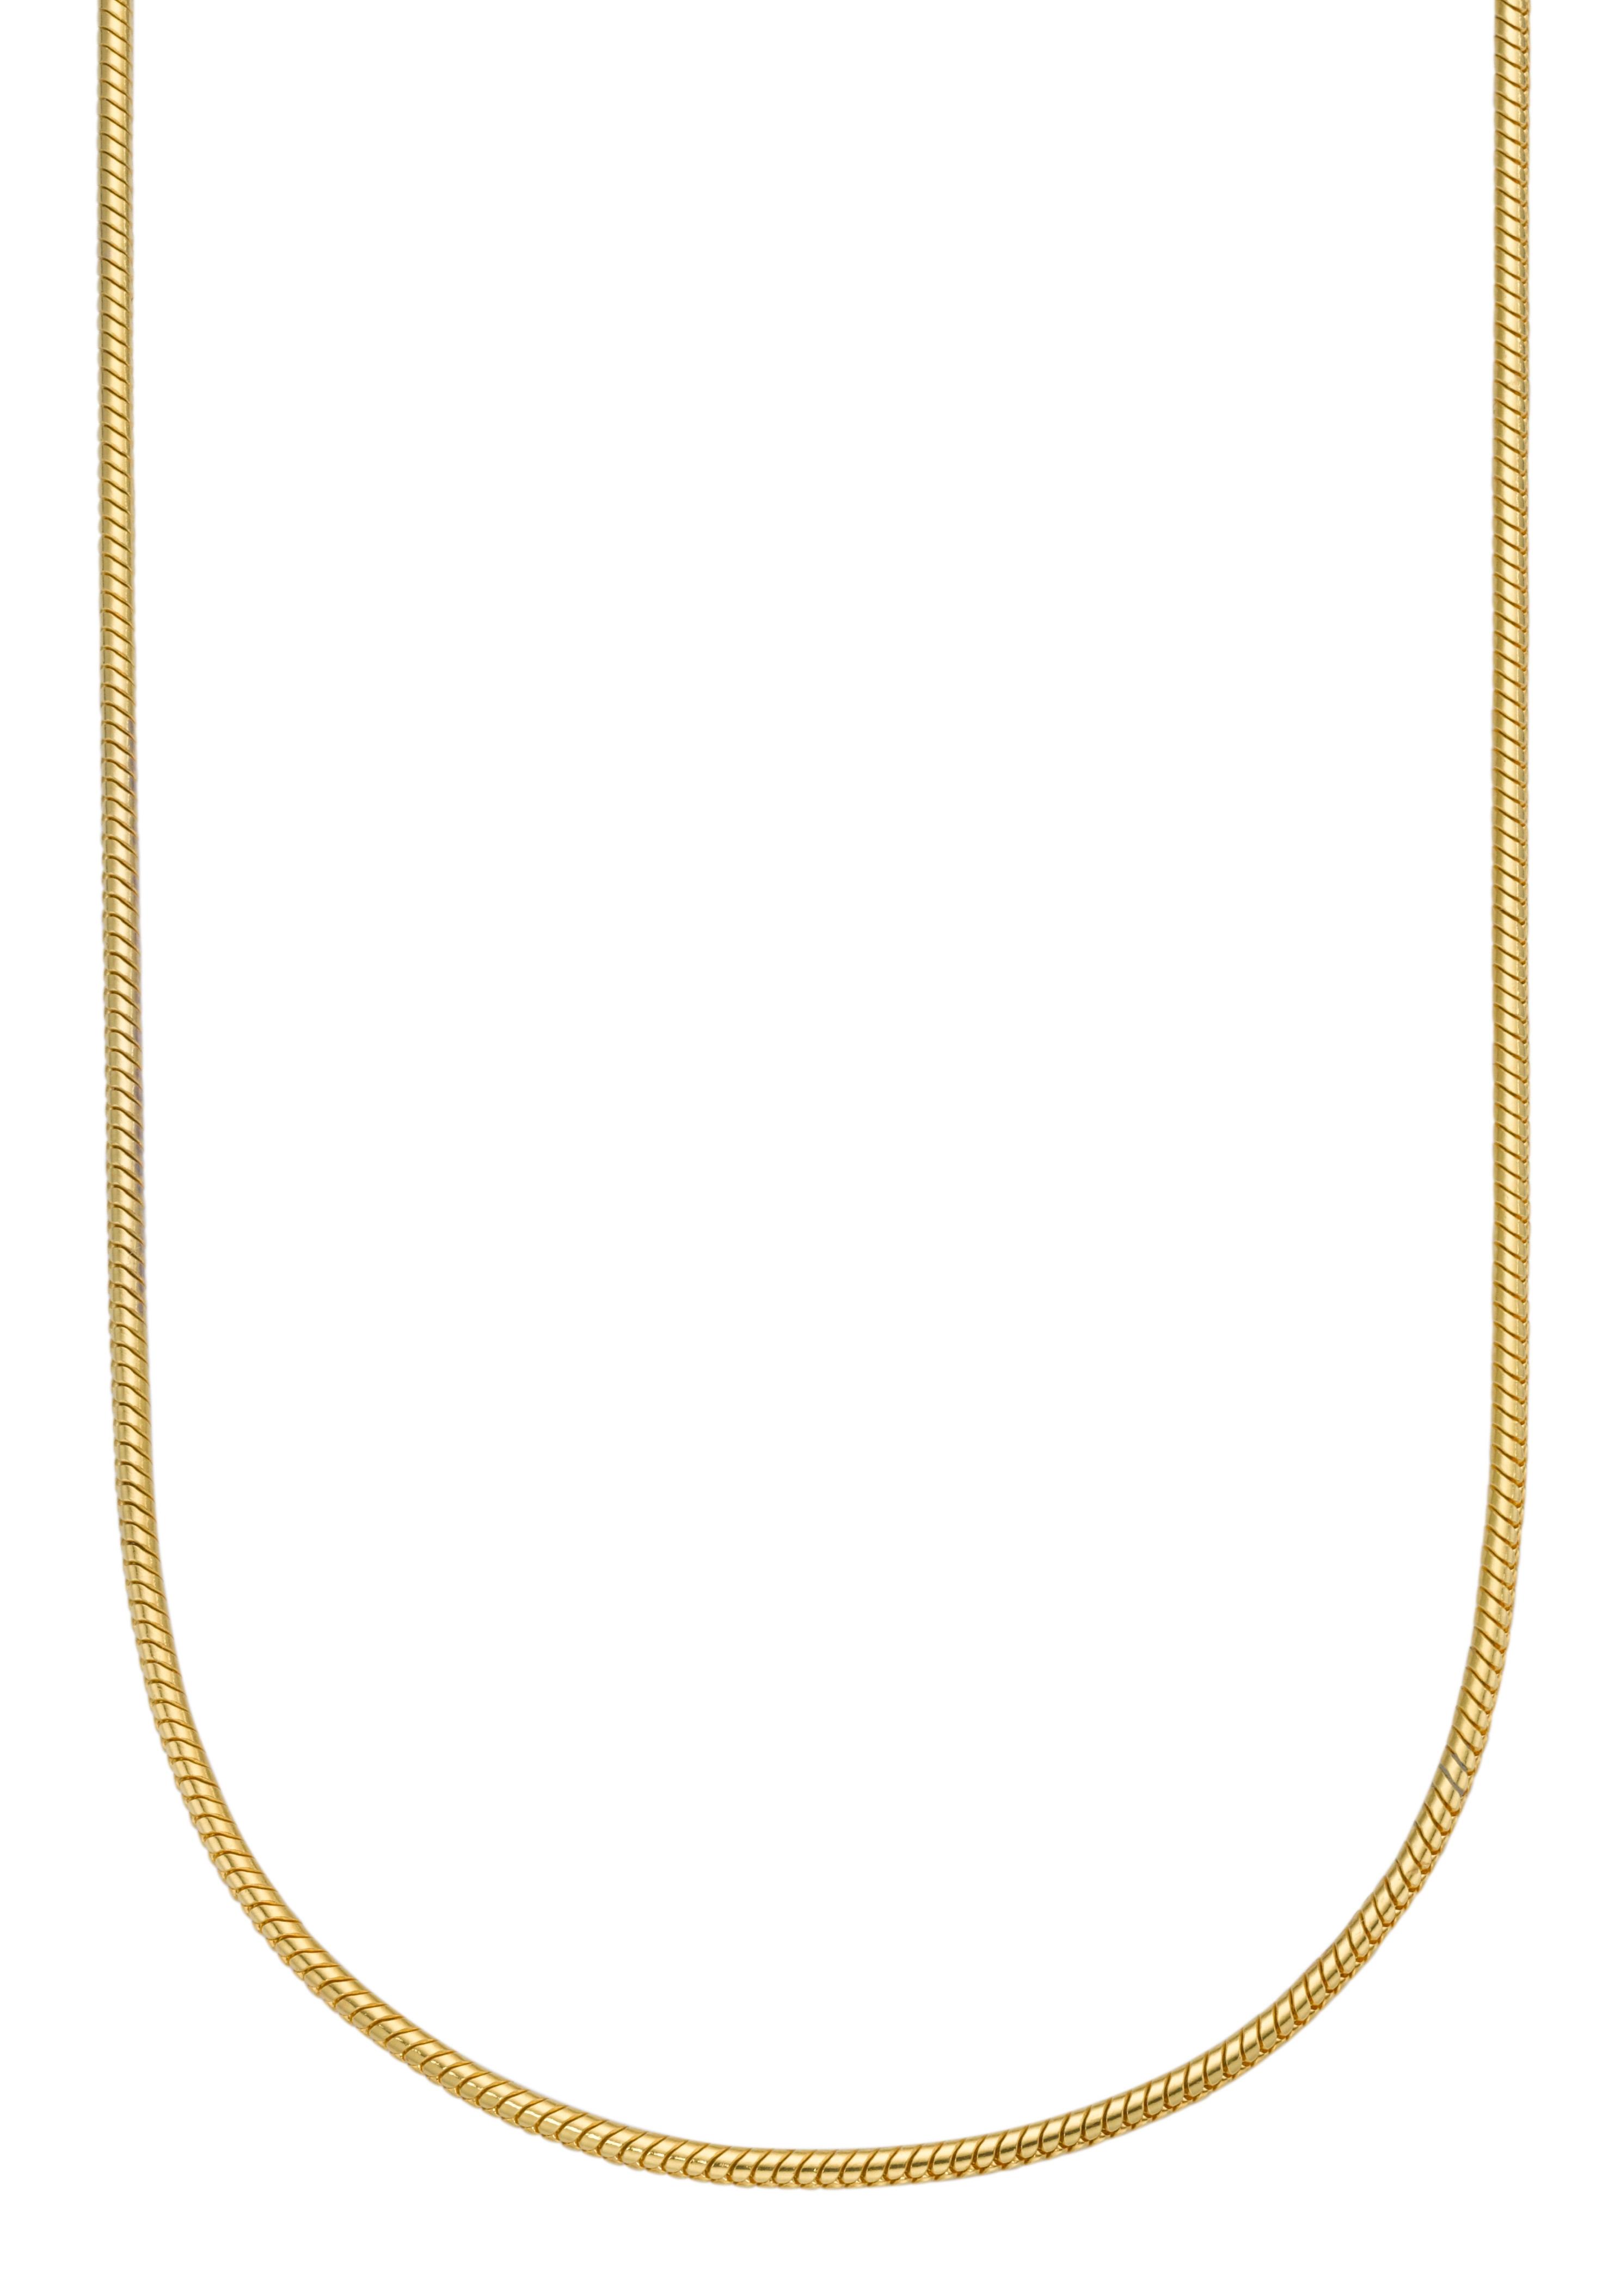 Firetti edelstalen ketting Met slangenkettingschakels, 1,5 mm breed, goudkleur Made in Germany in de webshop van OTTO kopen